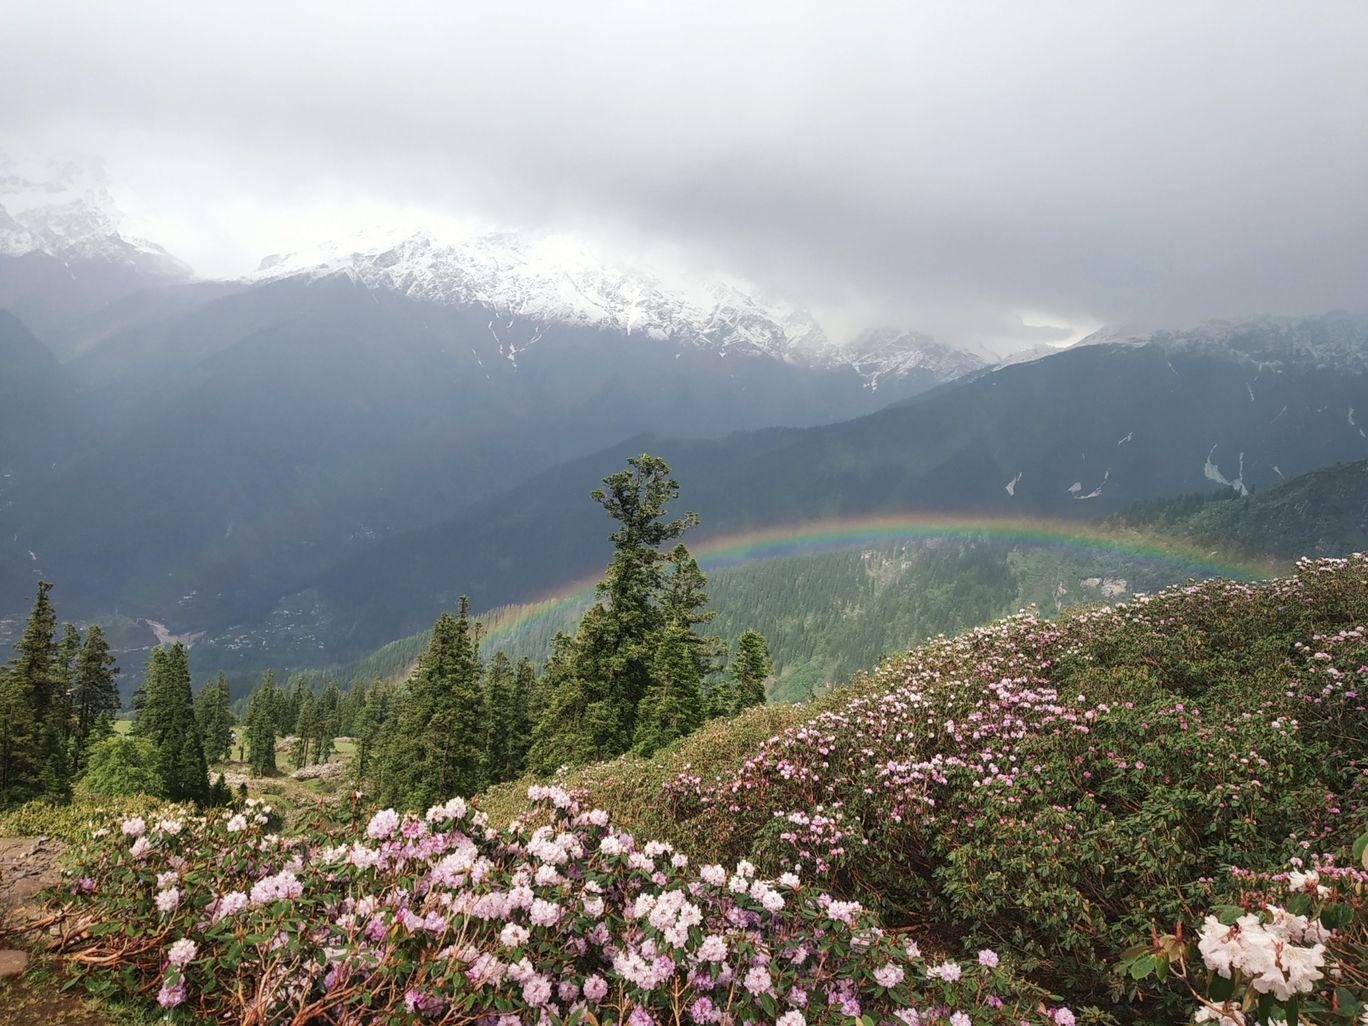 Photo of Grahan Camp - Sar Pass (YHAI) By Sourav Sethy